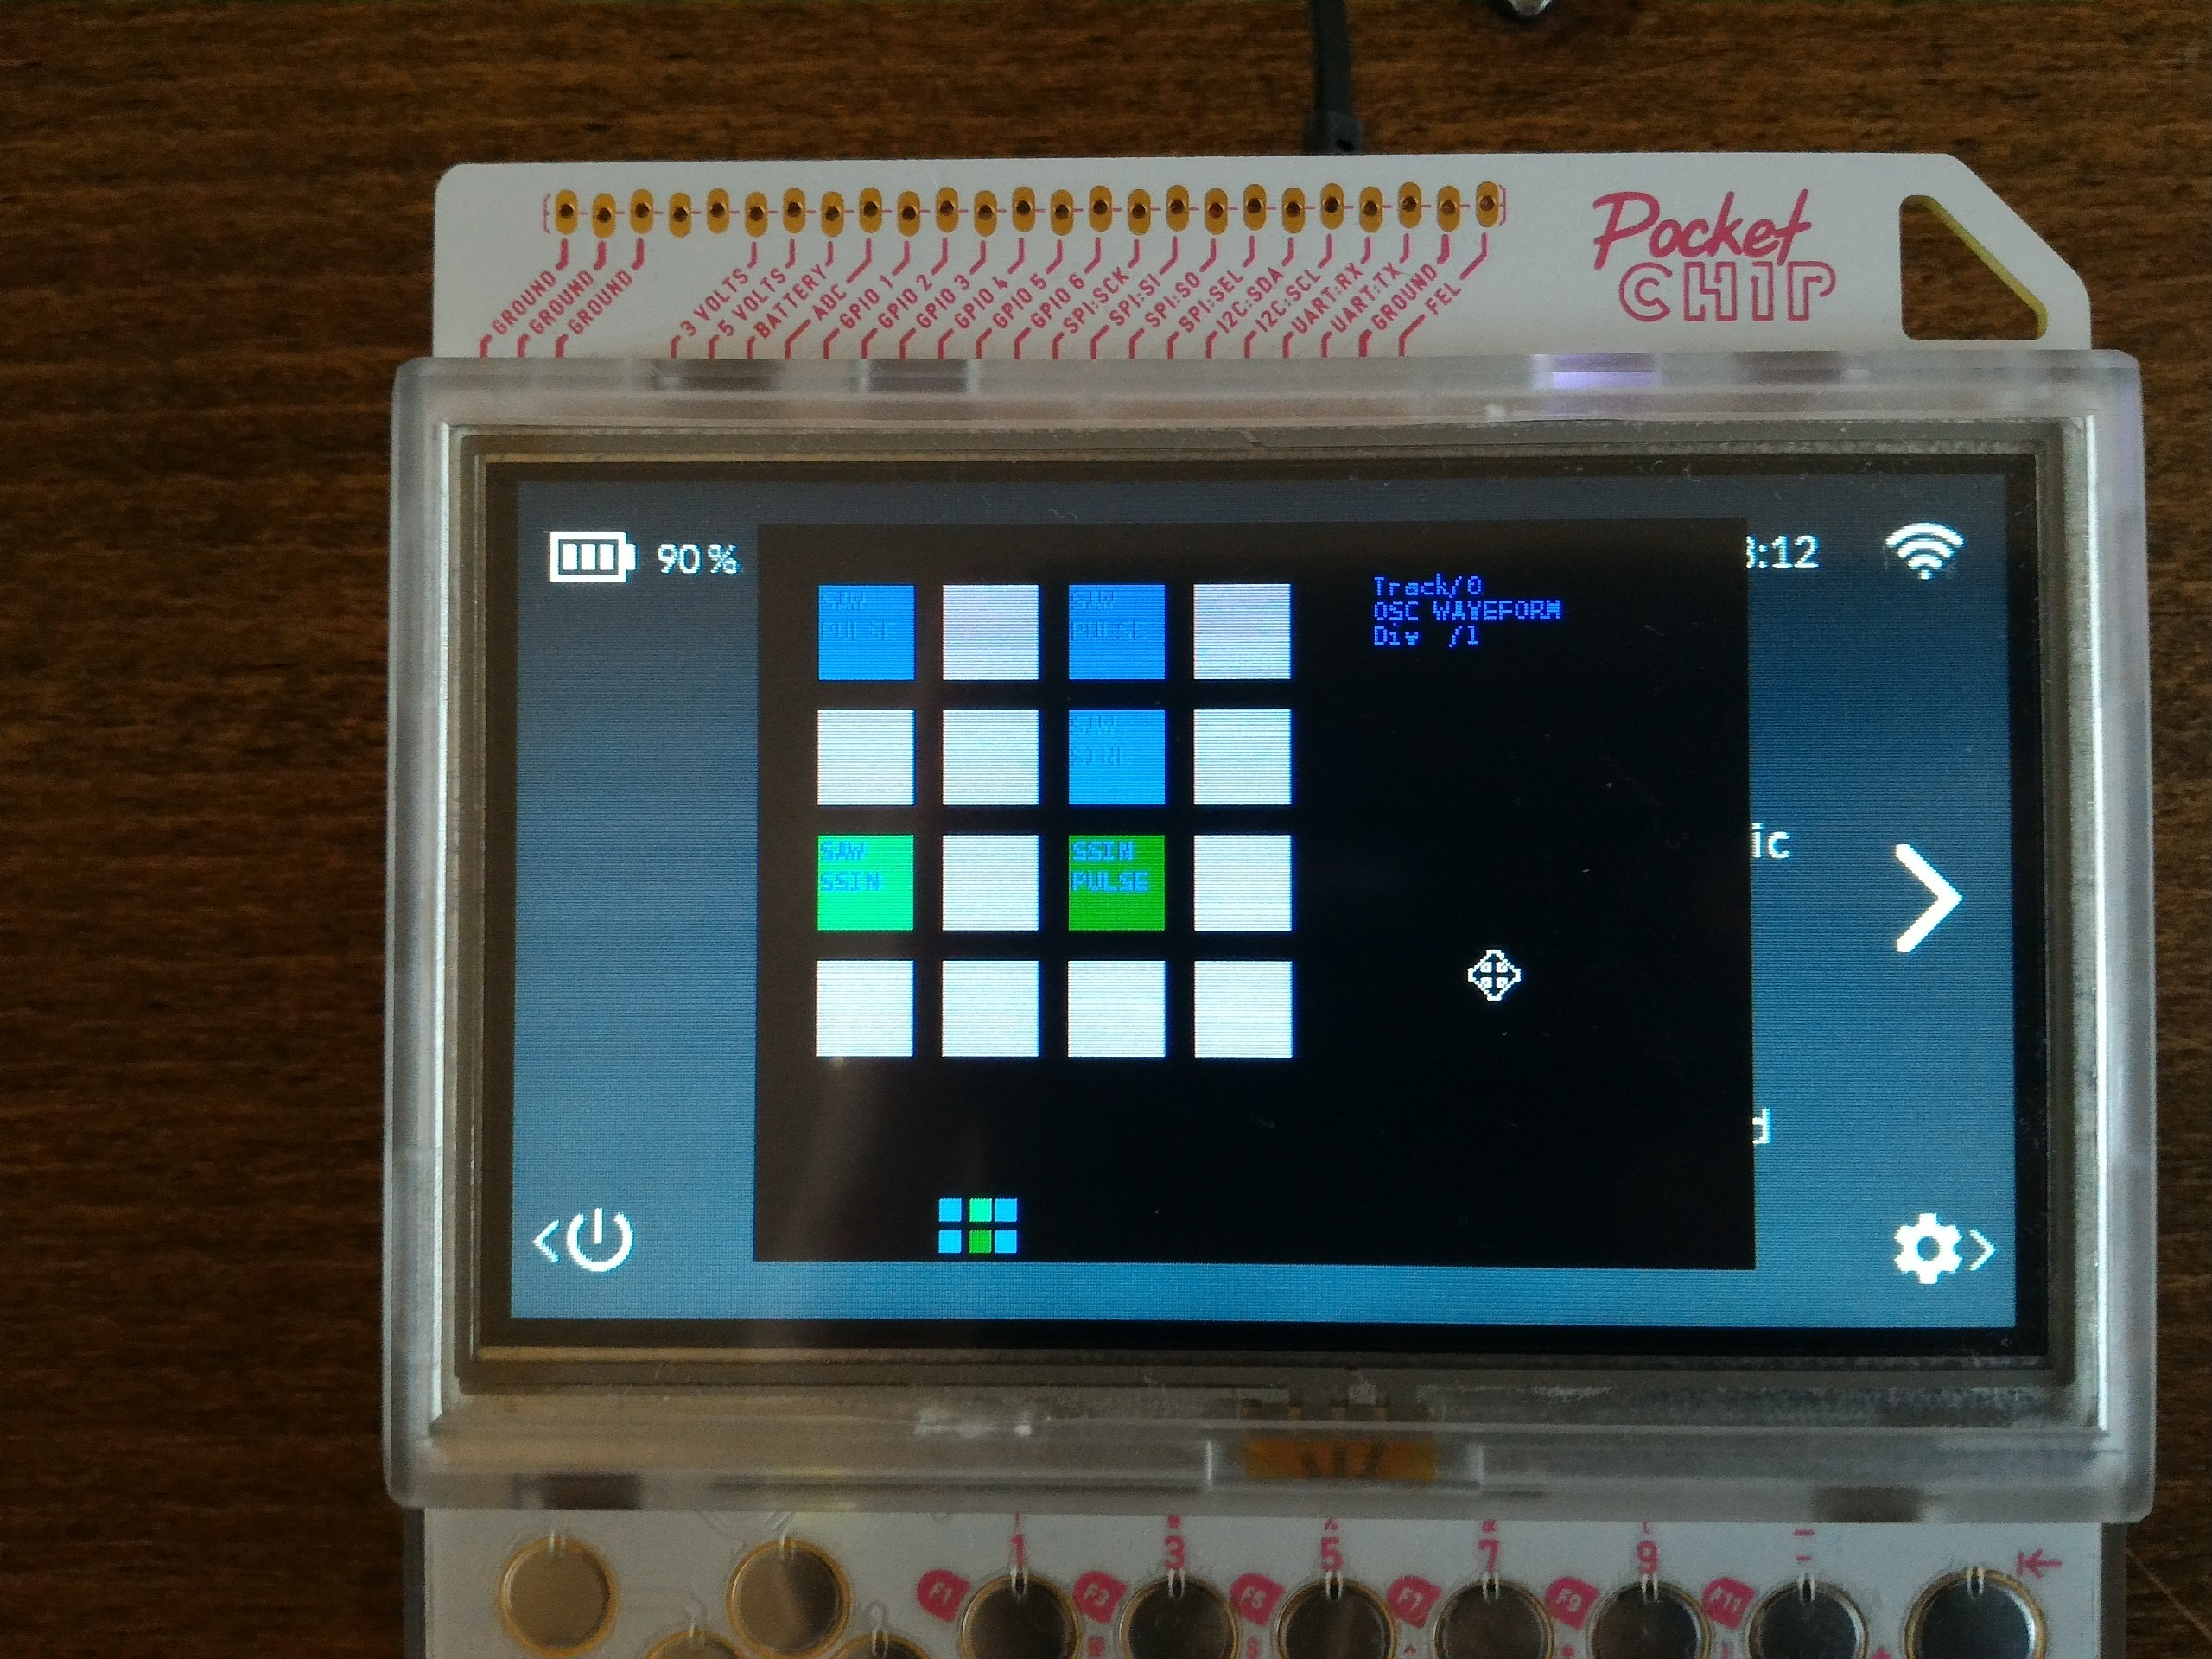 Picoloop nanoloop clone (Page 9) - Software & Plug-ins